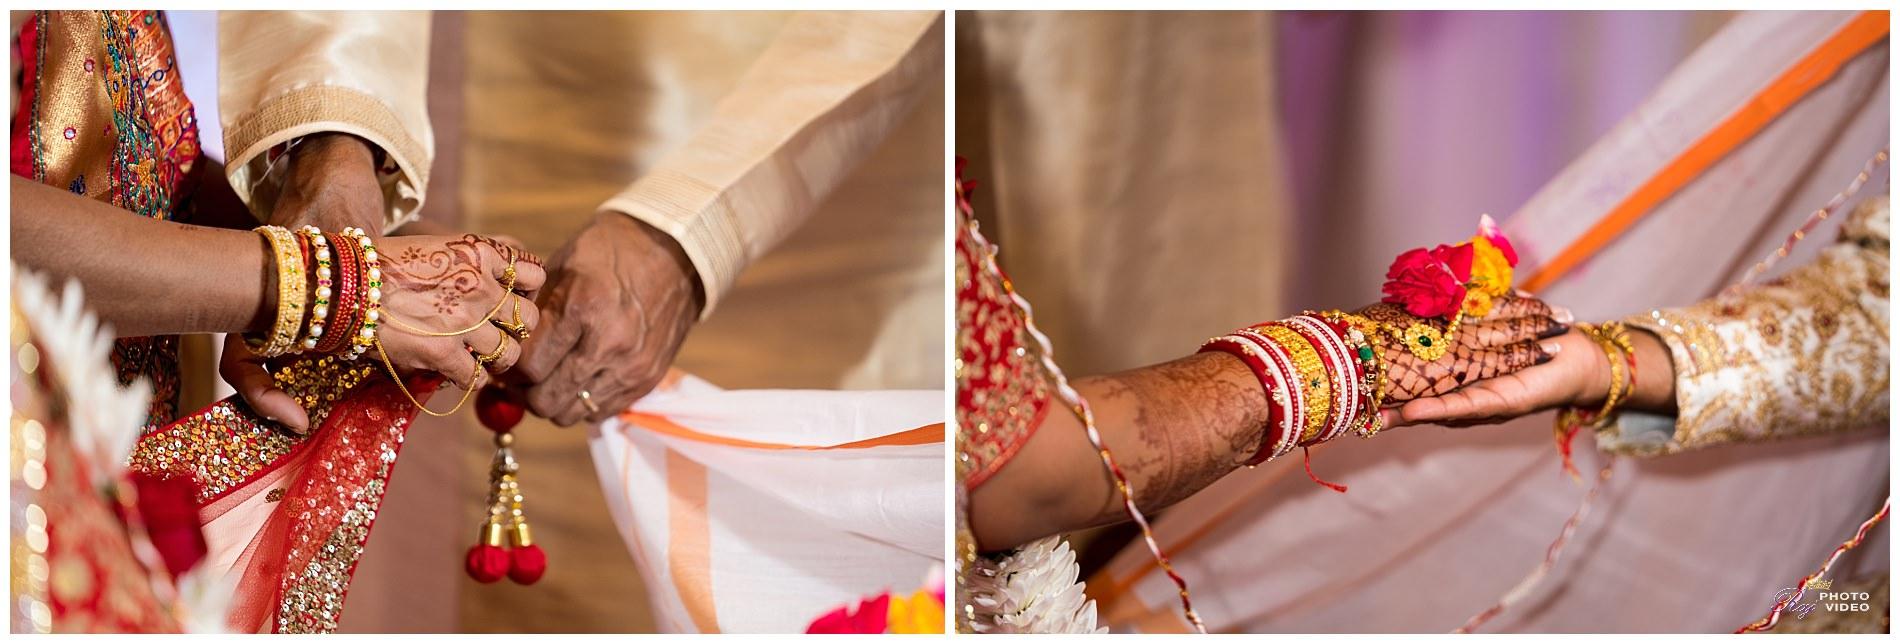 doubletree-by-hilton-hotel-wilmington-de-wedding-krishna-ritesh-60.jpg